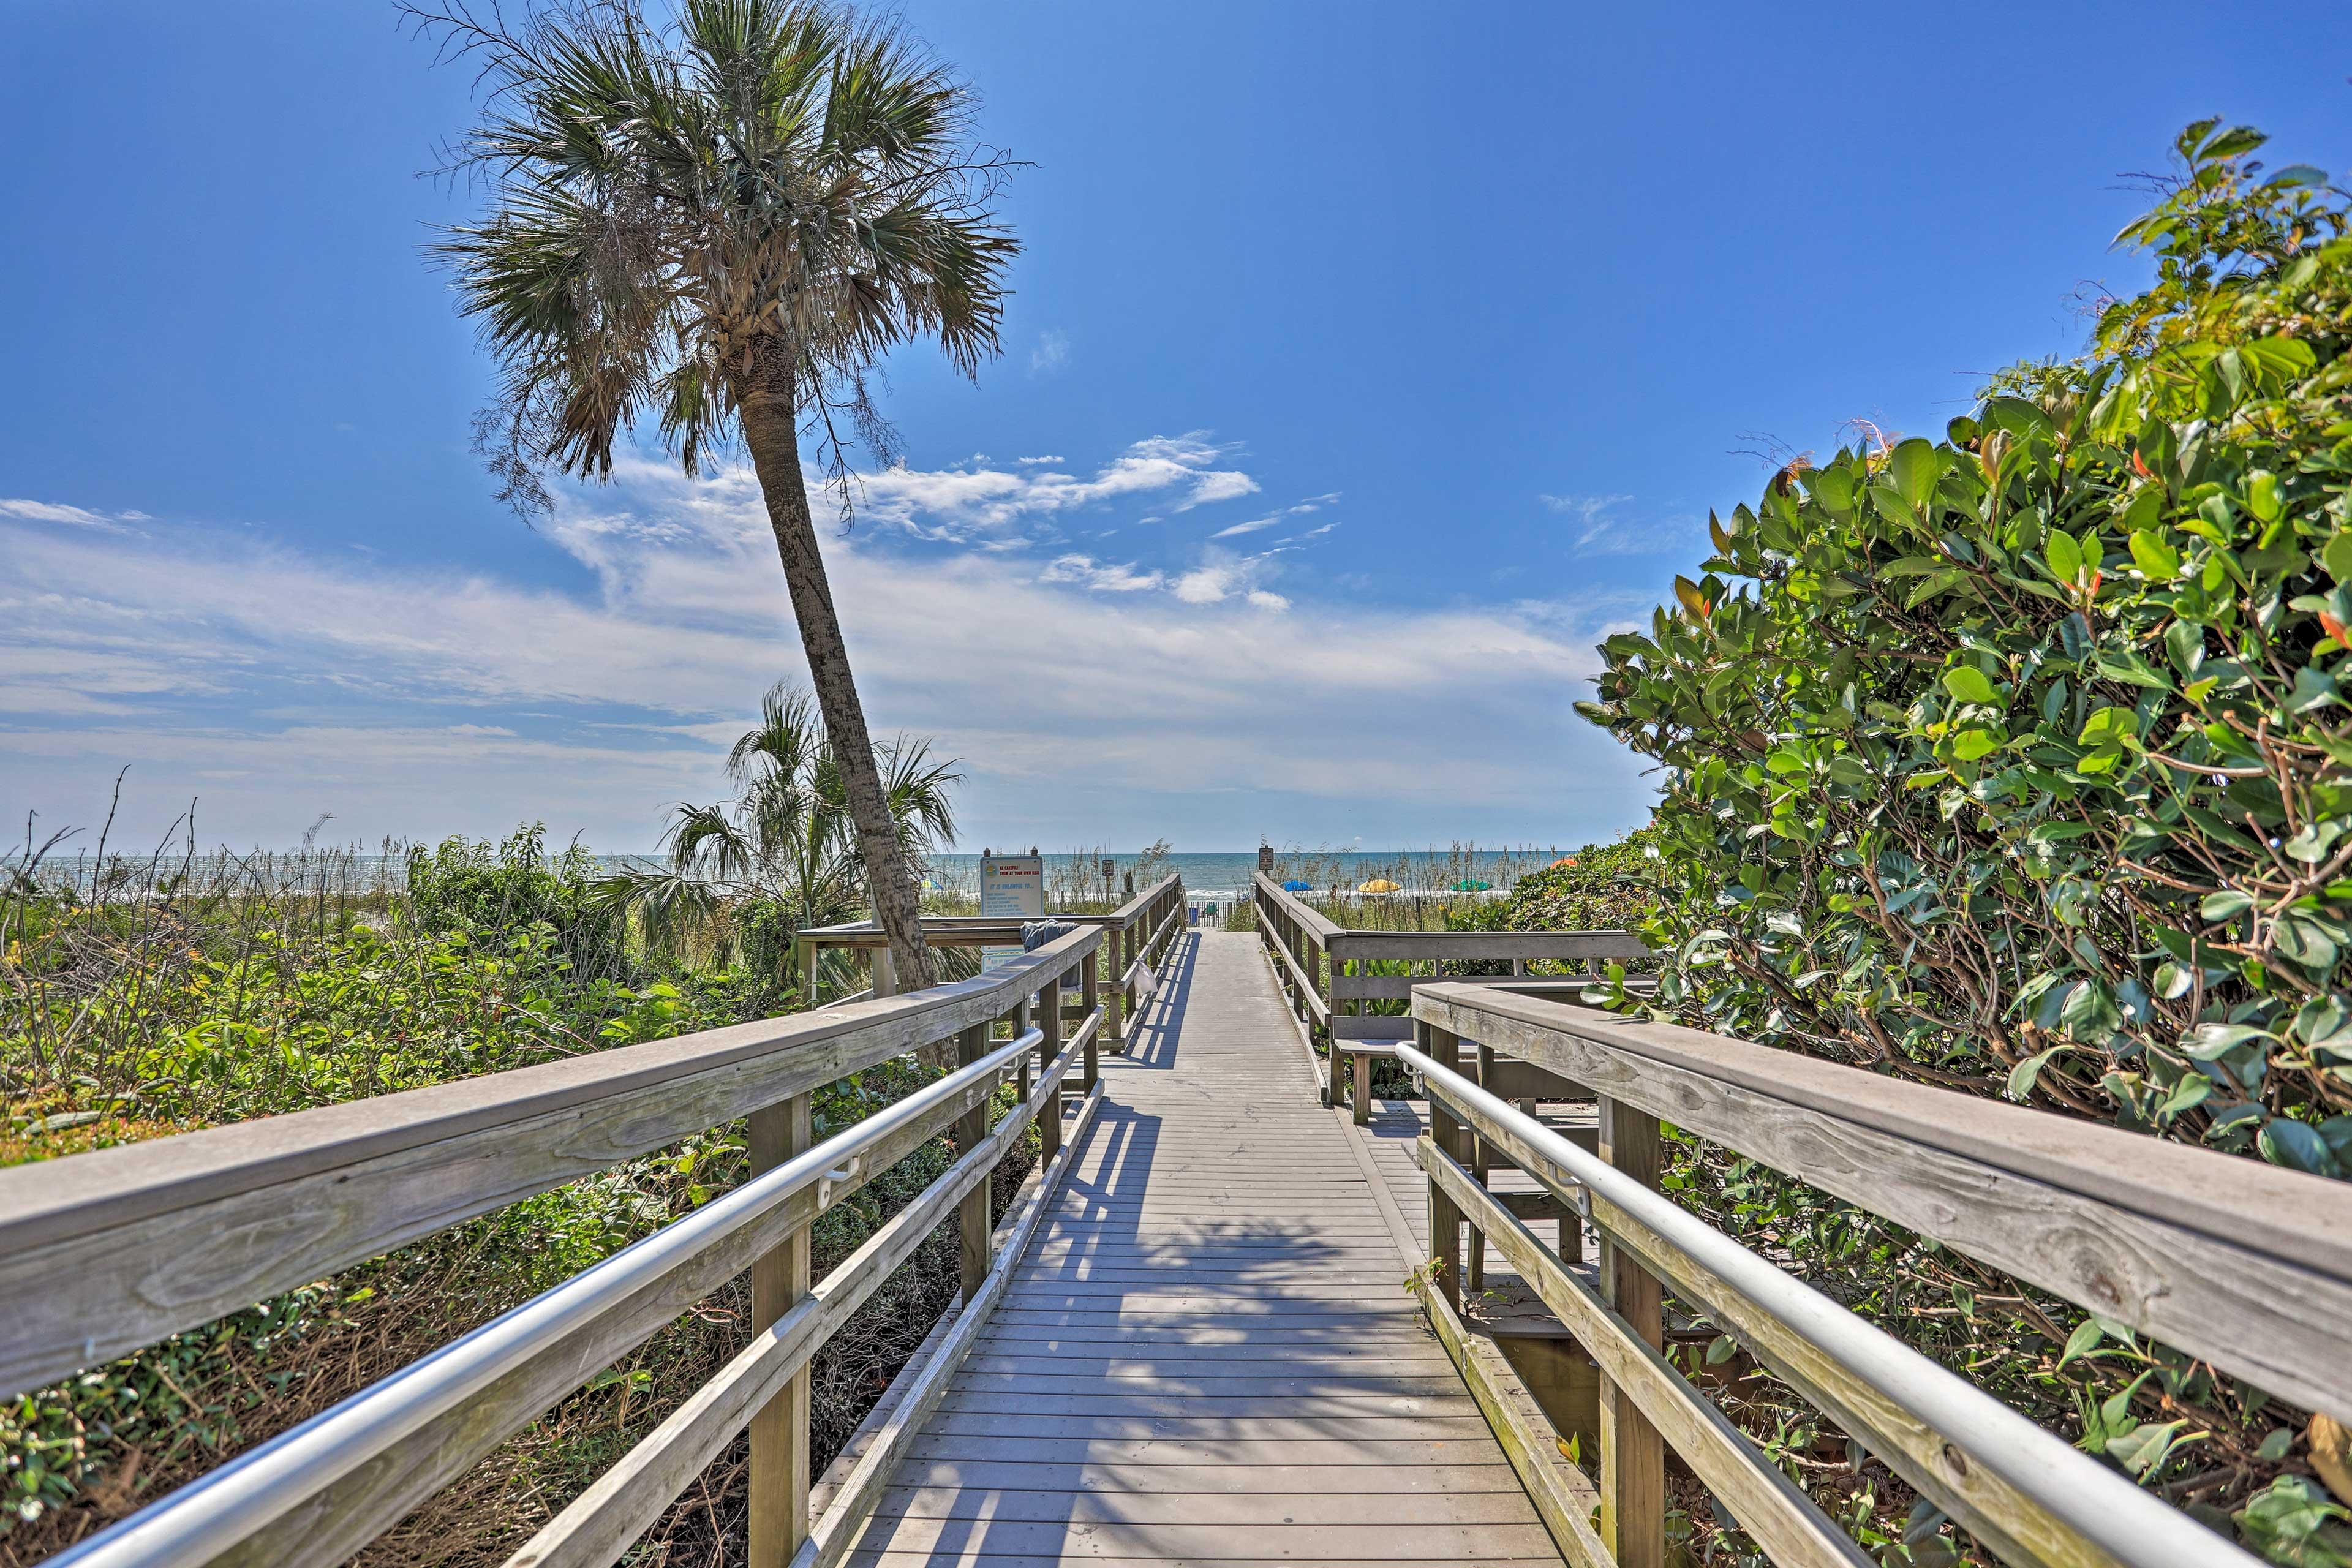 Stroll down the boardwalk to the beach!